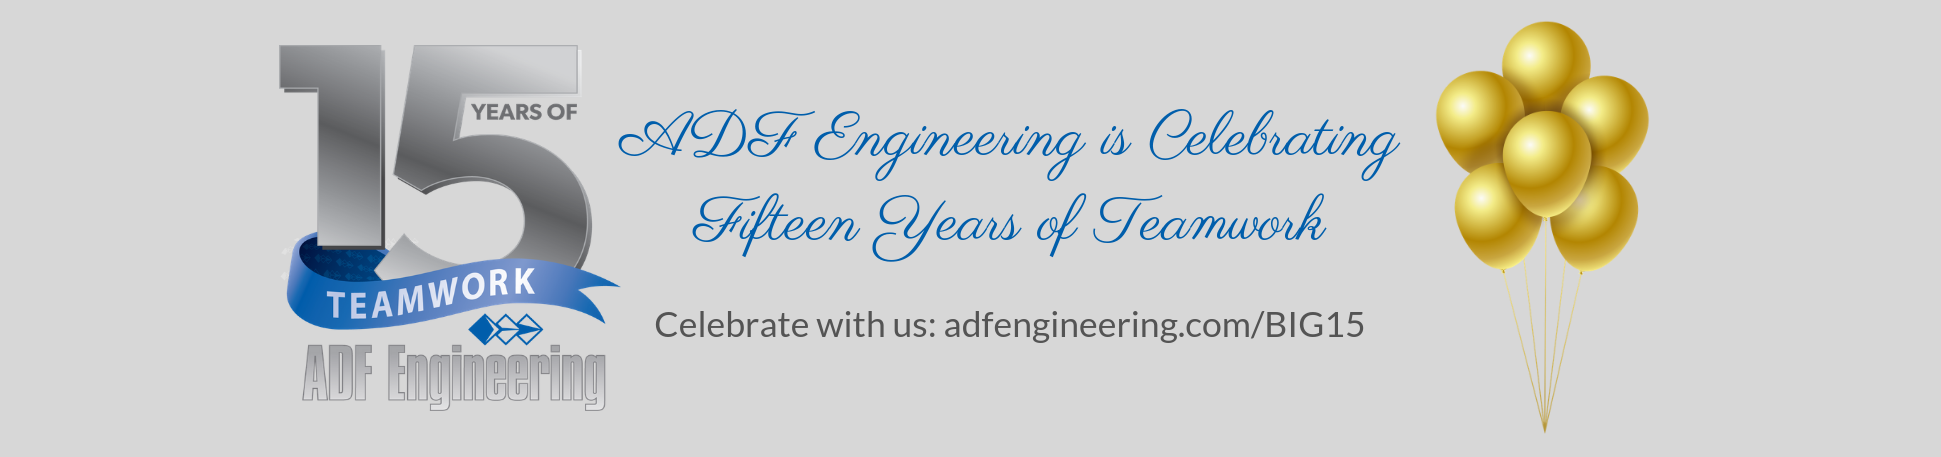 ADF Celebrates 15th Anniversary